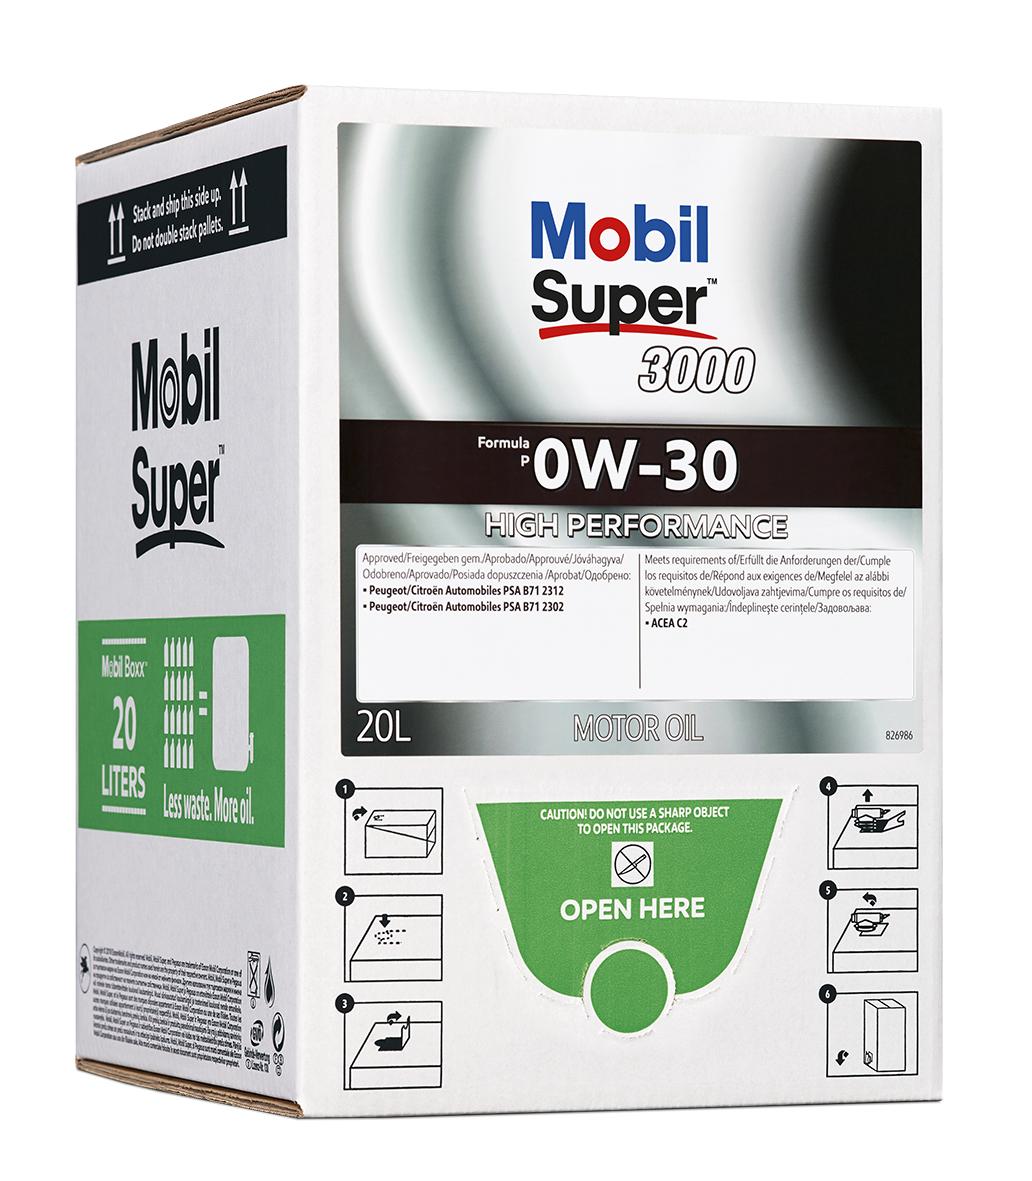 Mobil Super 3000 Formula P 0W-30, BIB 20L